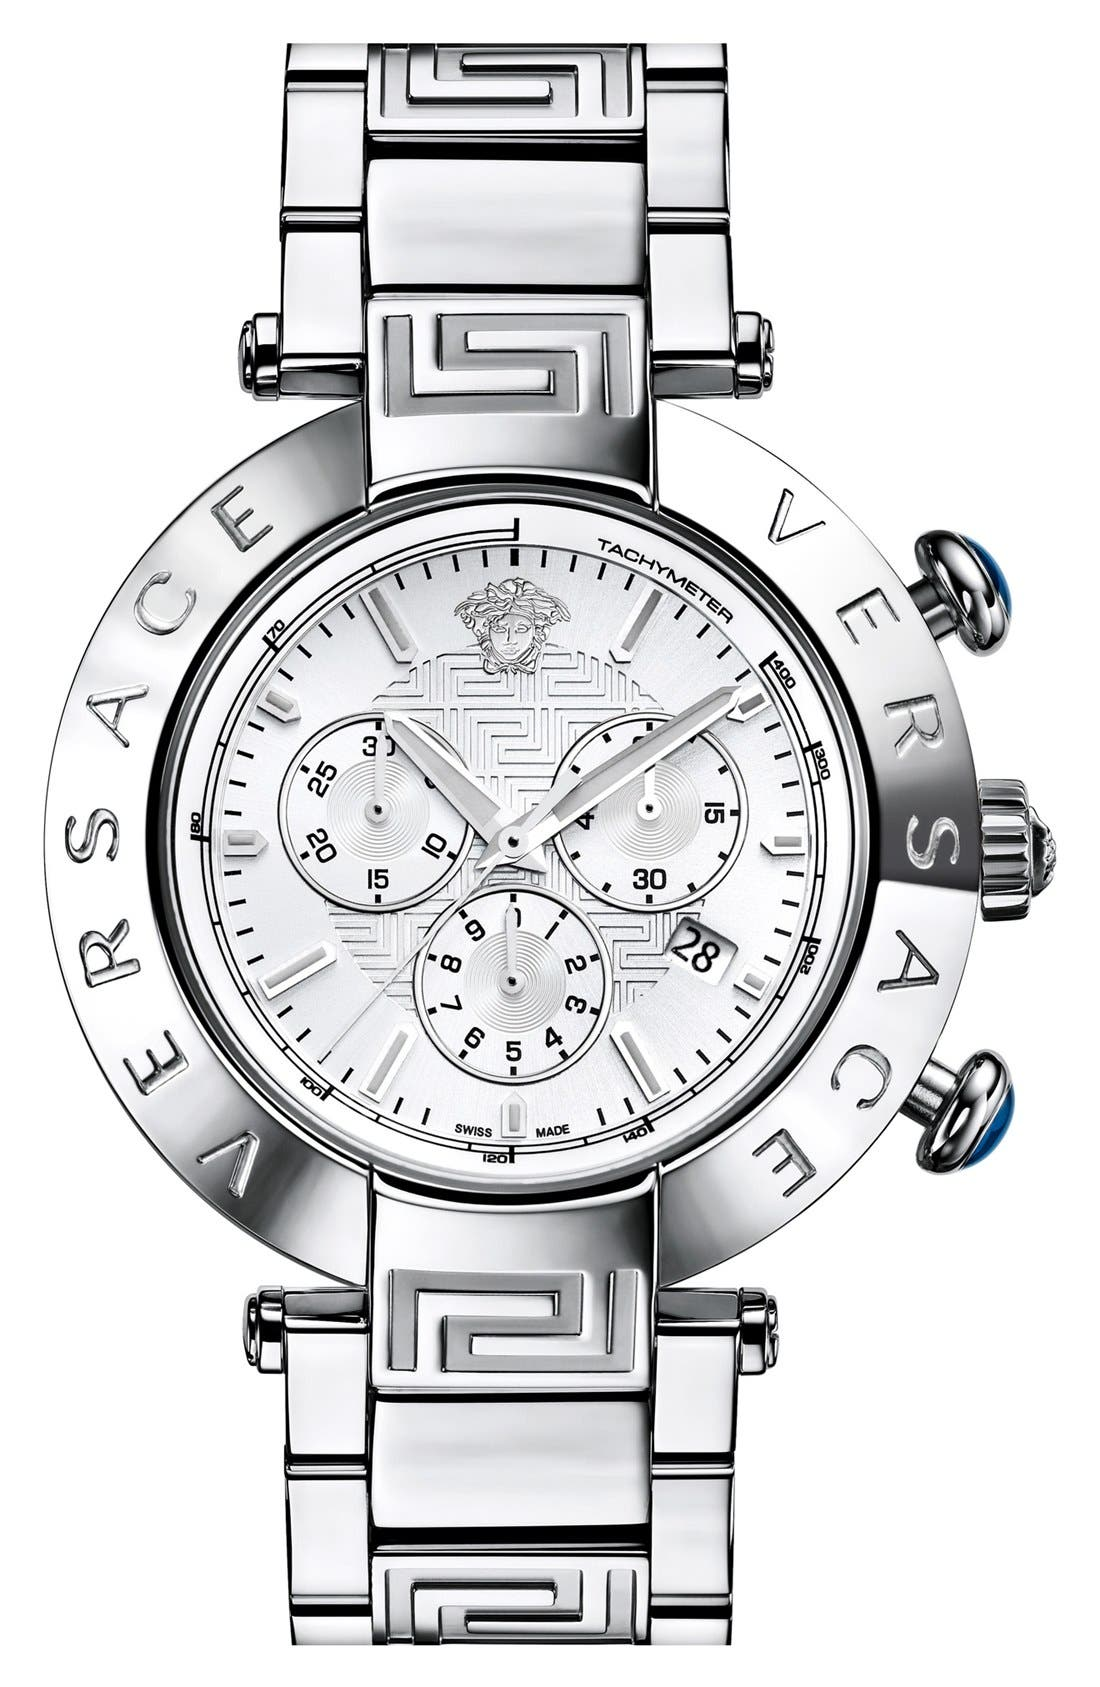 Alternate Image 1 Selected - Versace 'Reve' Chronograph Bracelet Watch, 46mm